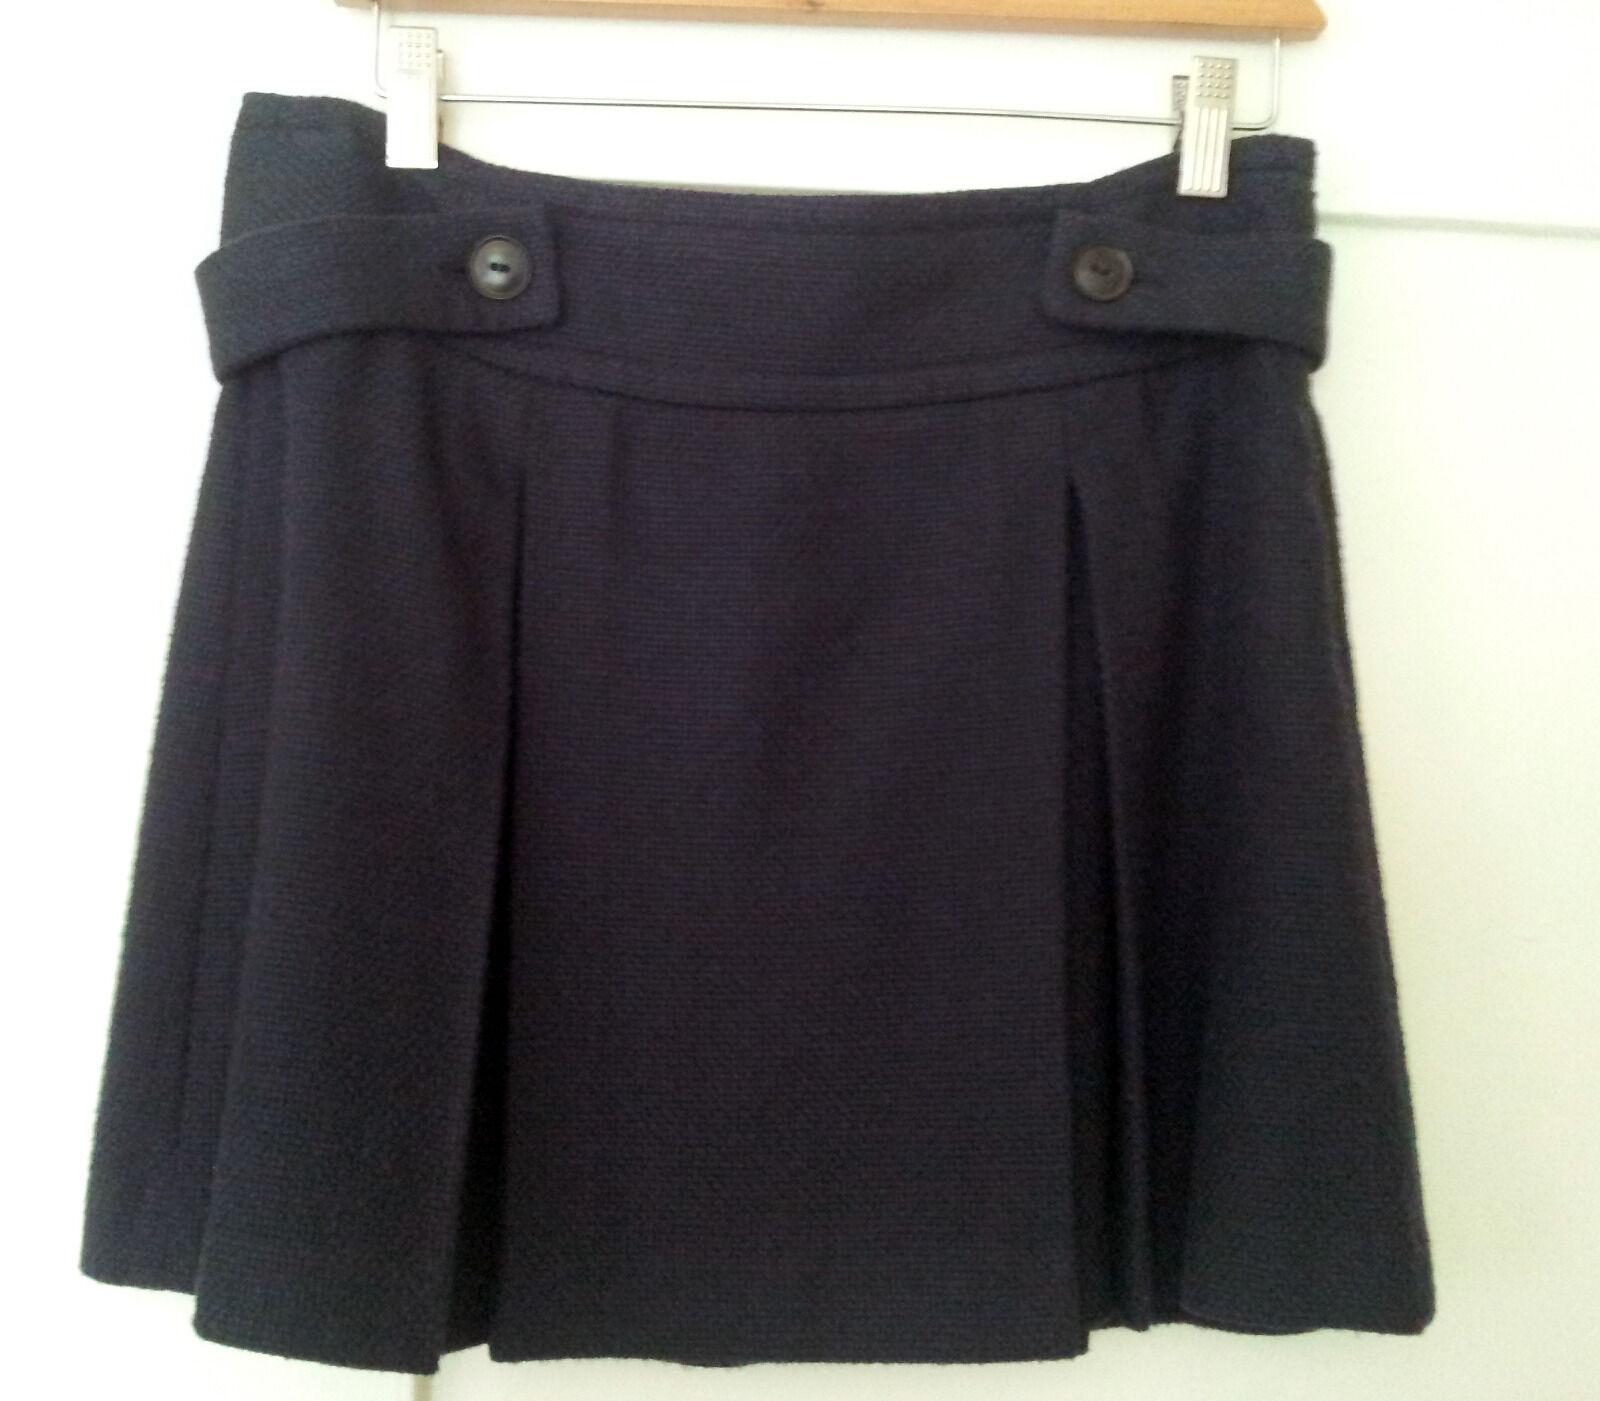 DKNY Short Skirt navy bluee woven - NWT Womens 4